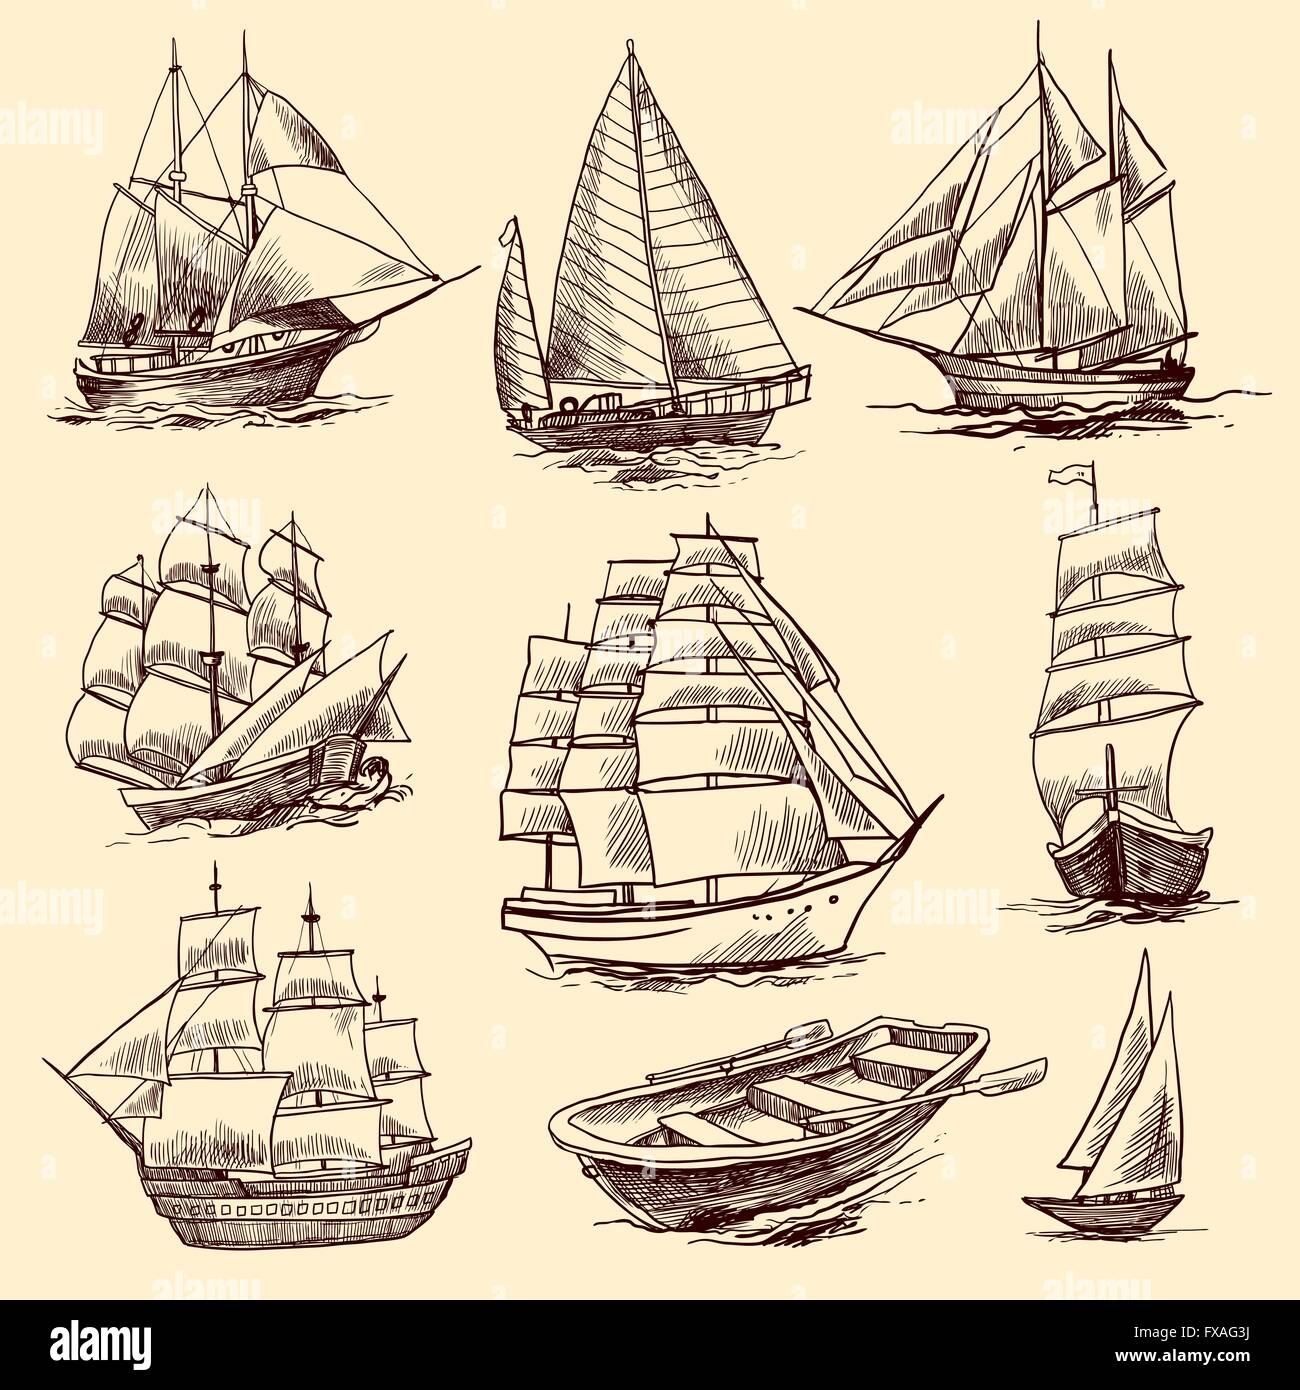 Ships and boats sketch set - Stock Vector